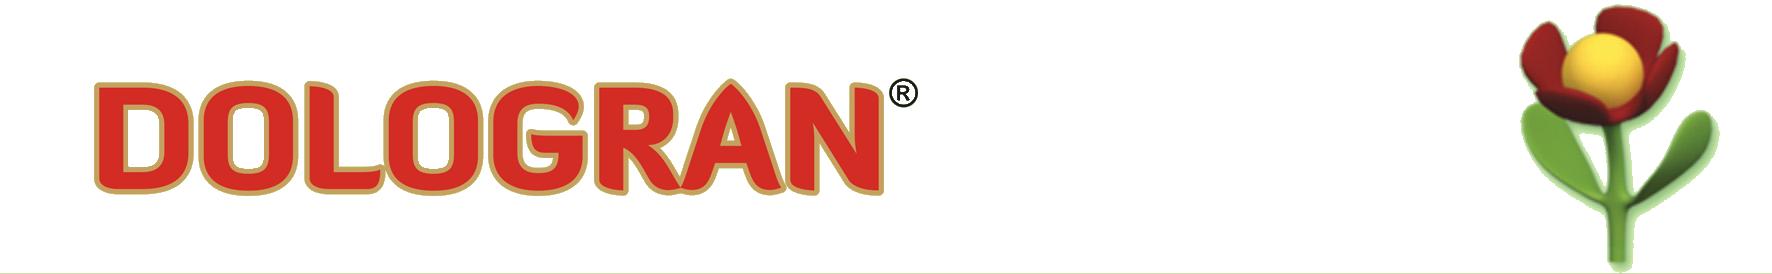 DOLOGRAN